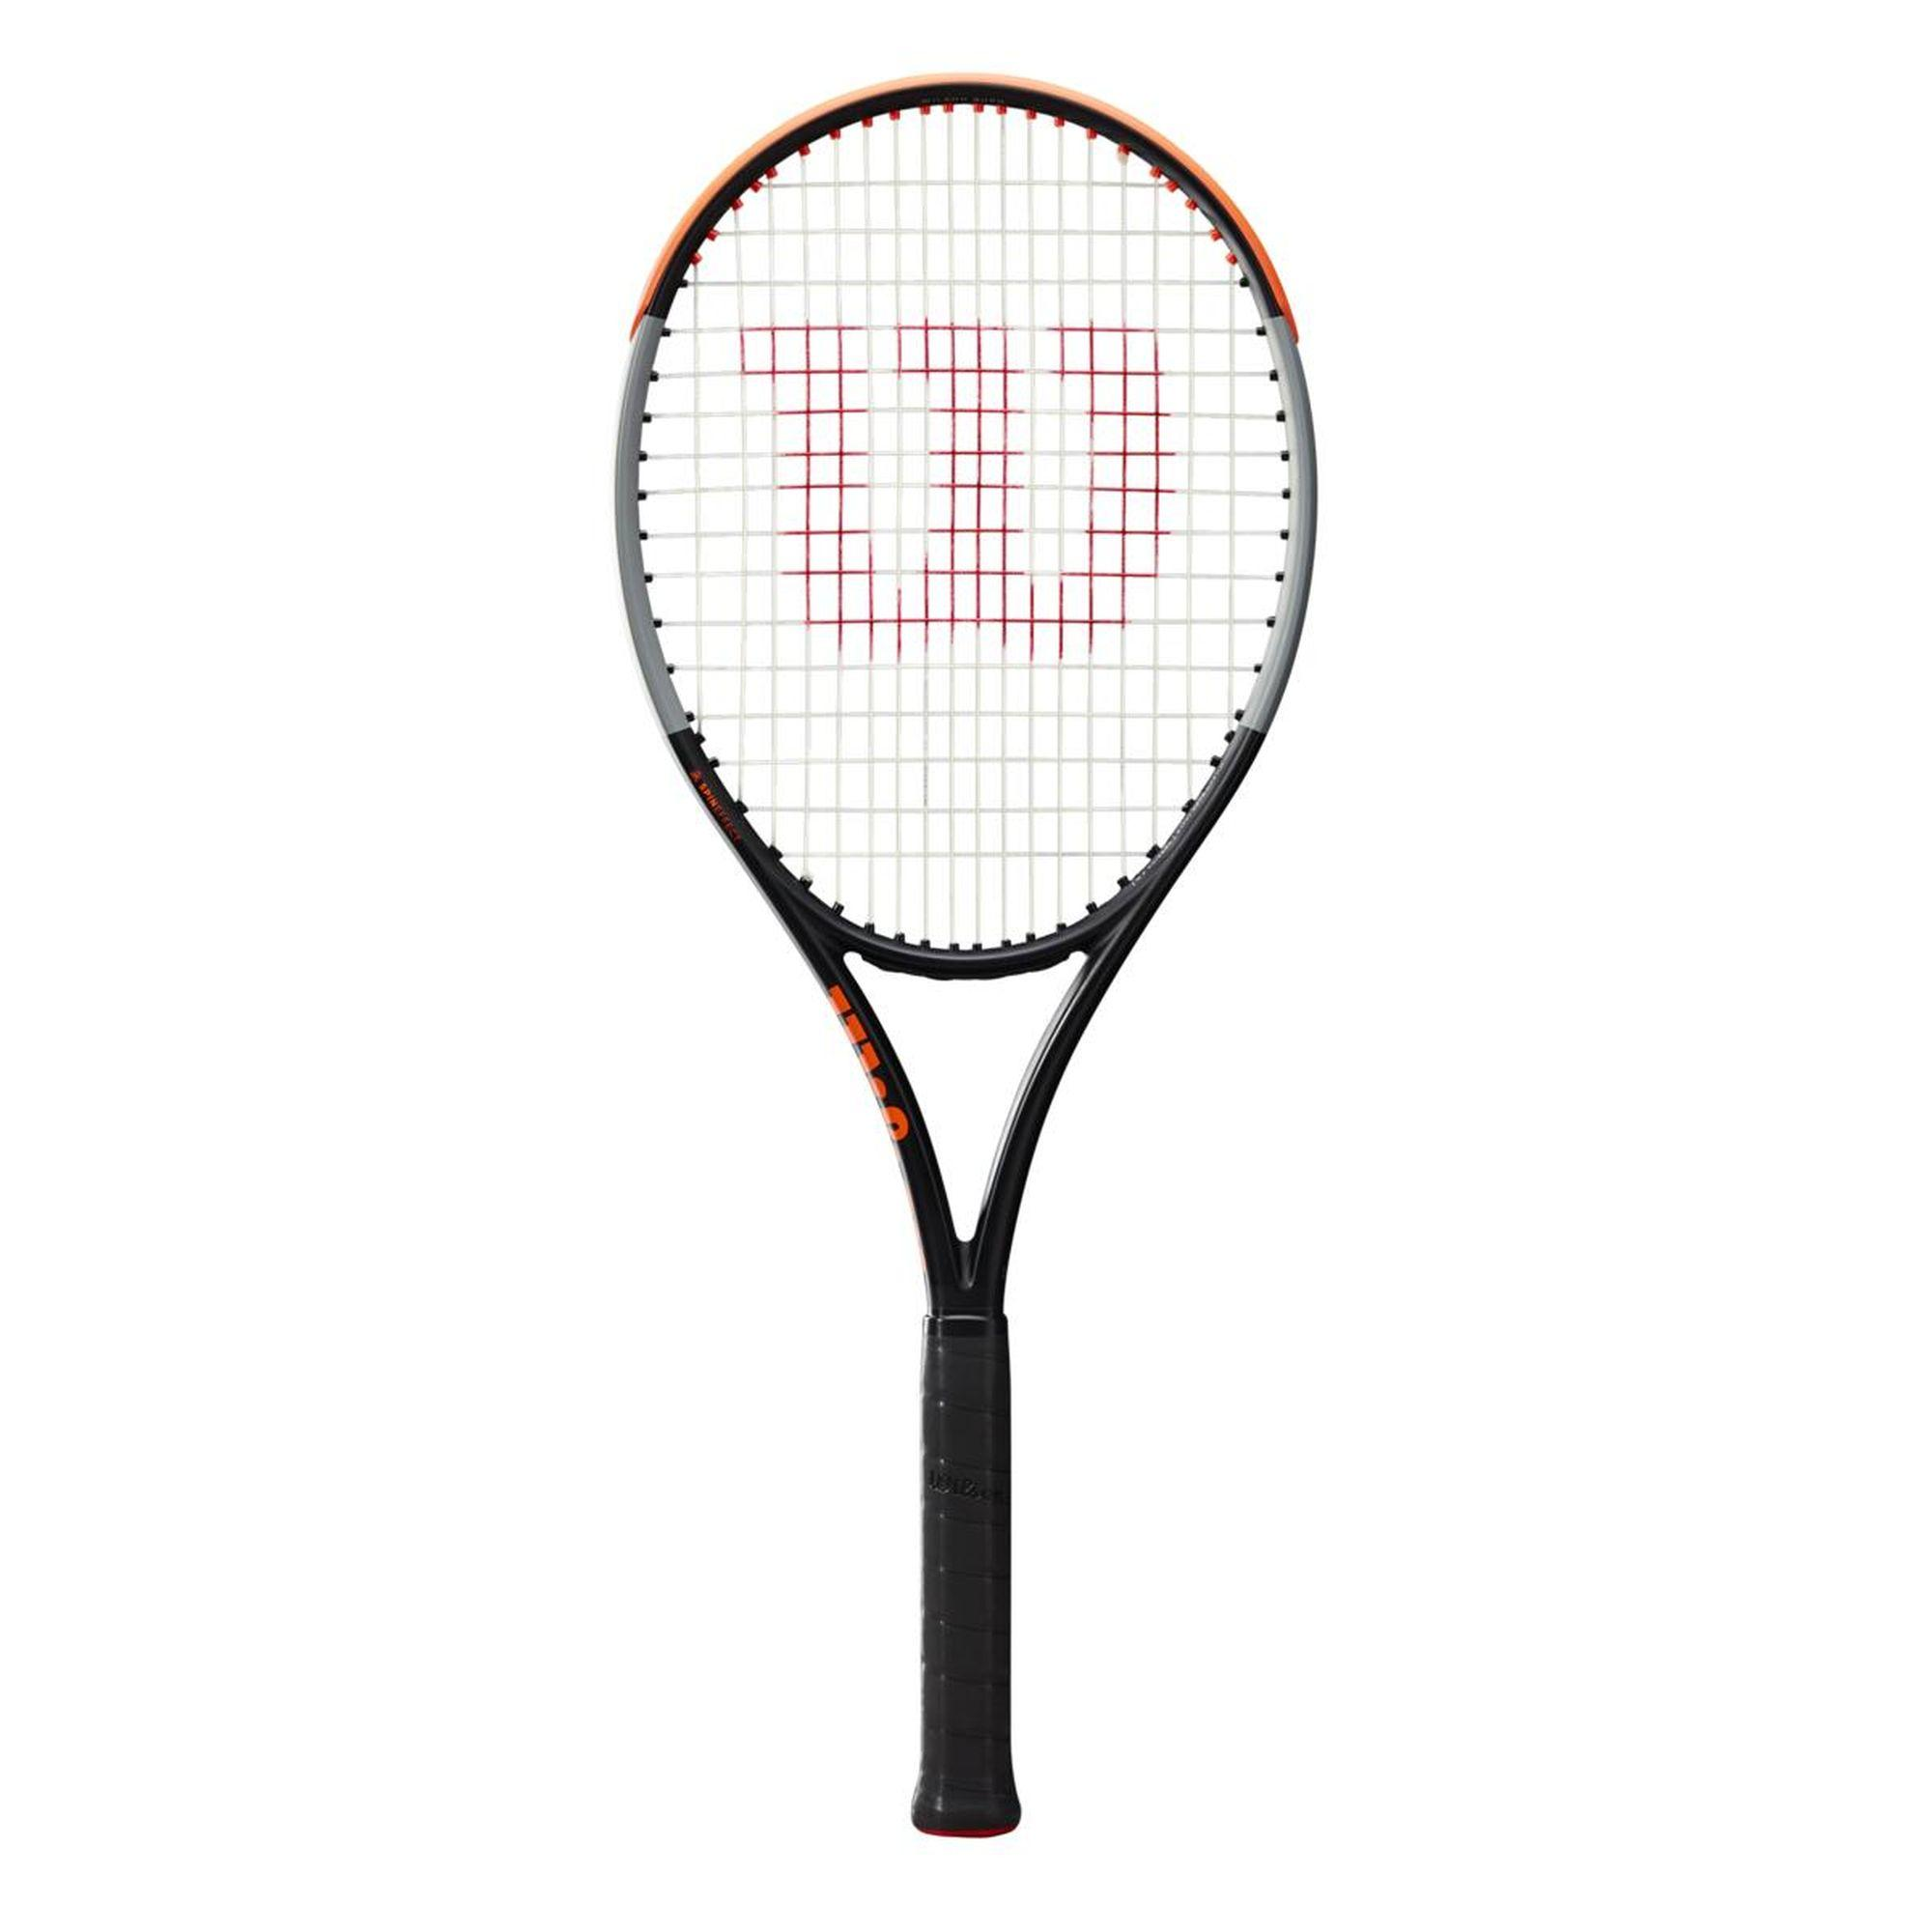 Rachetă Tenis BURN 100LS V4.0 imagine